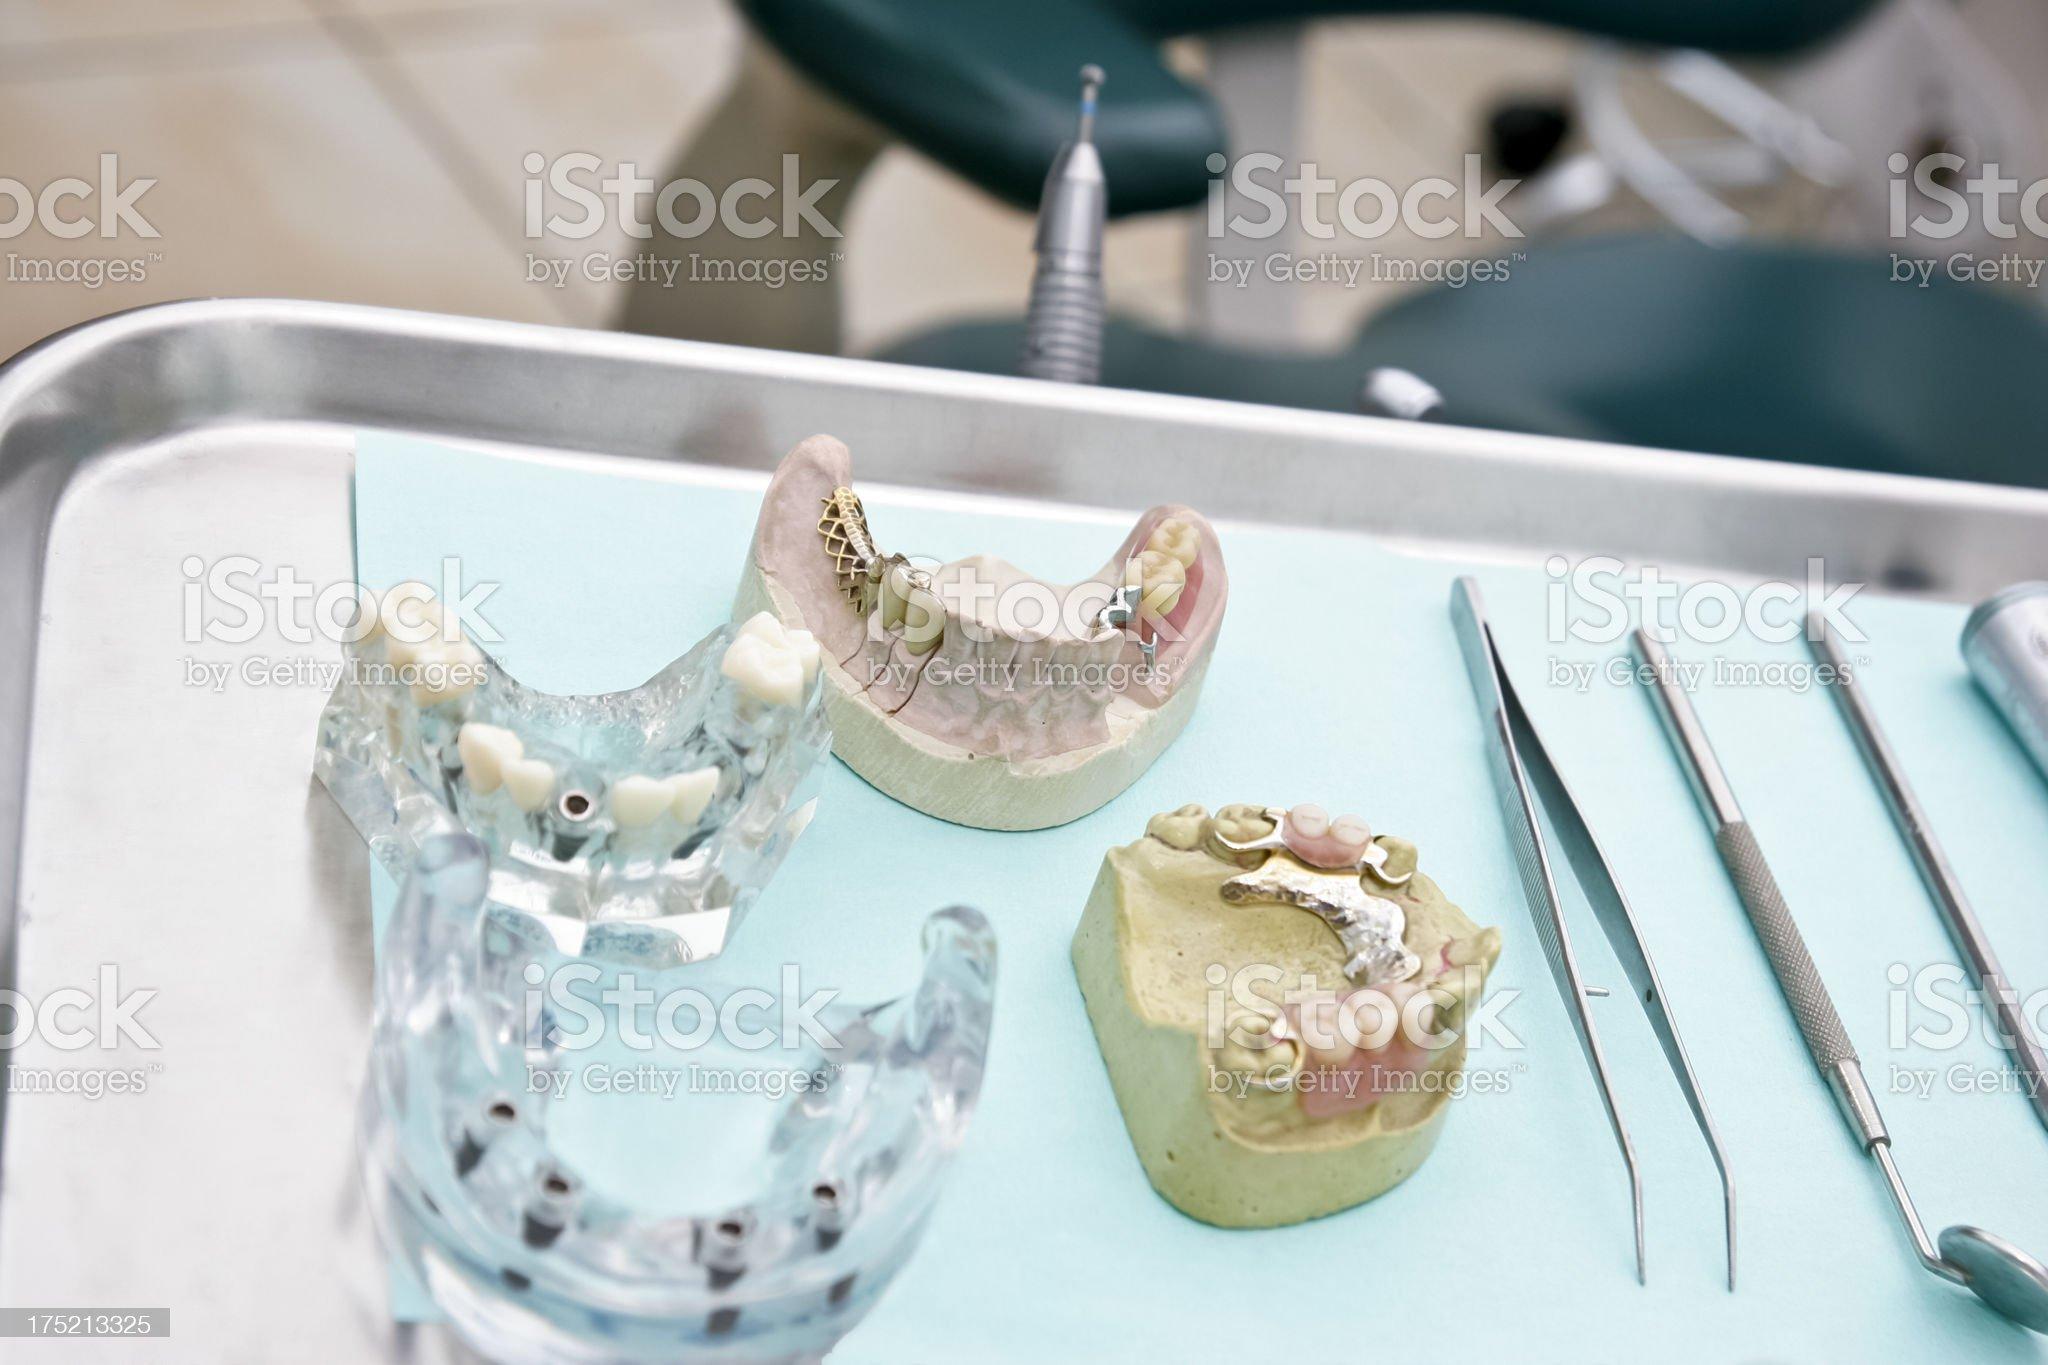 High Tech Dentures royalty-free stock photo